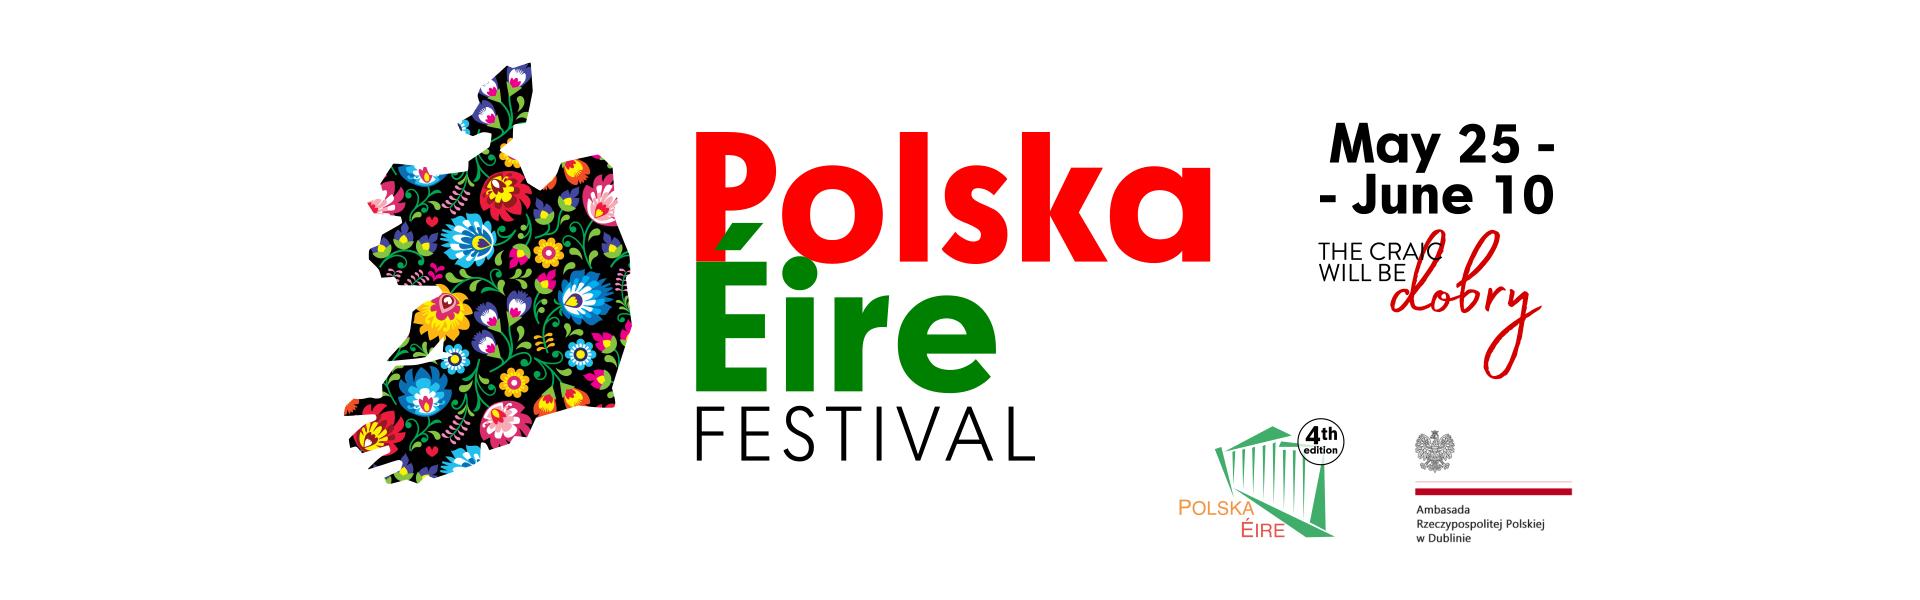 PolskaÉire Festival